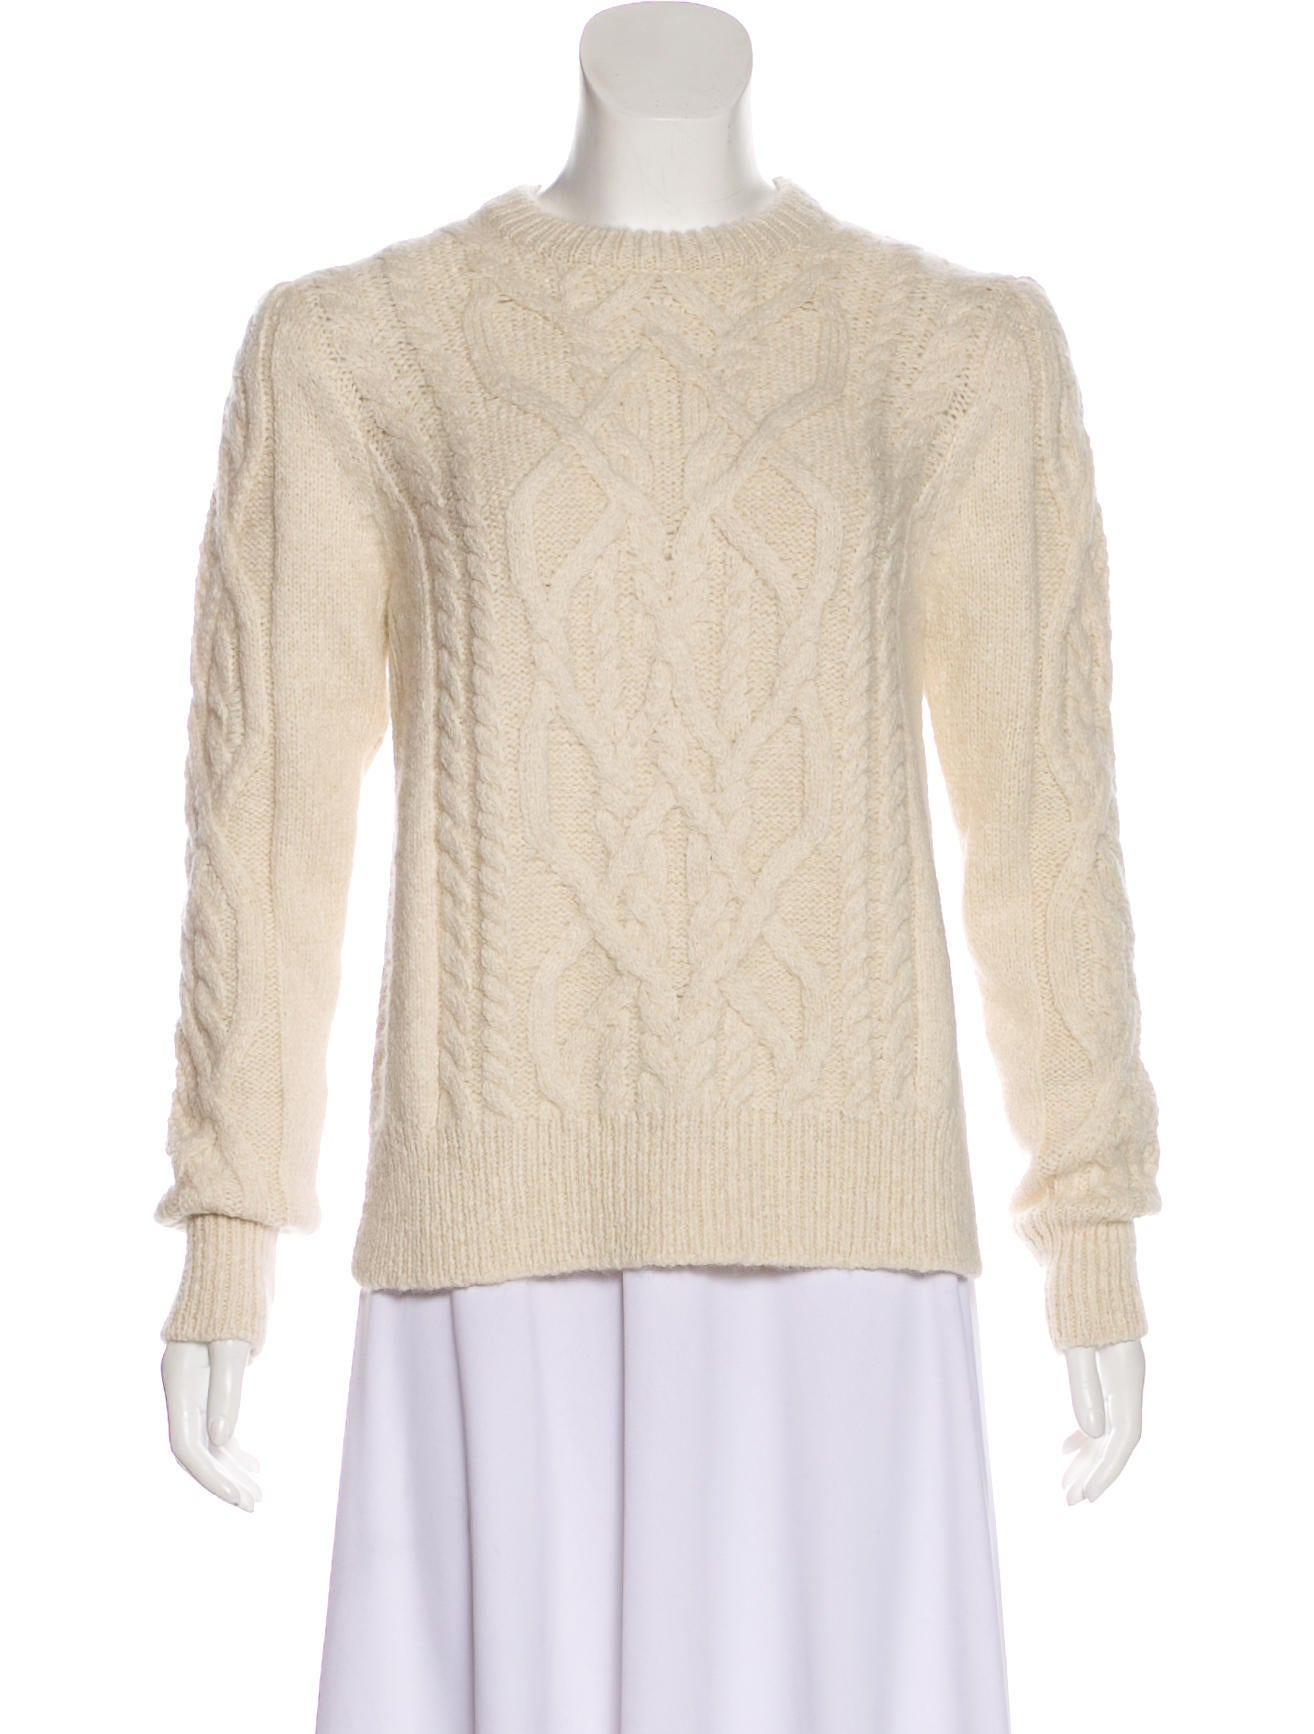 1fa97bb760c3 Isabel Marant Baby Alpaca Cable Knit Sweater - Clothing - ISA61435 ...